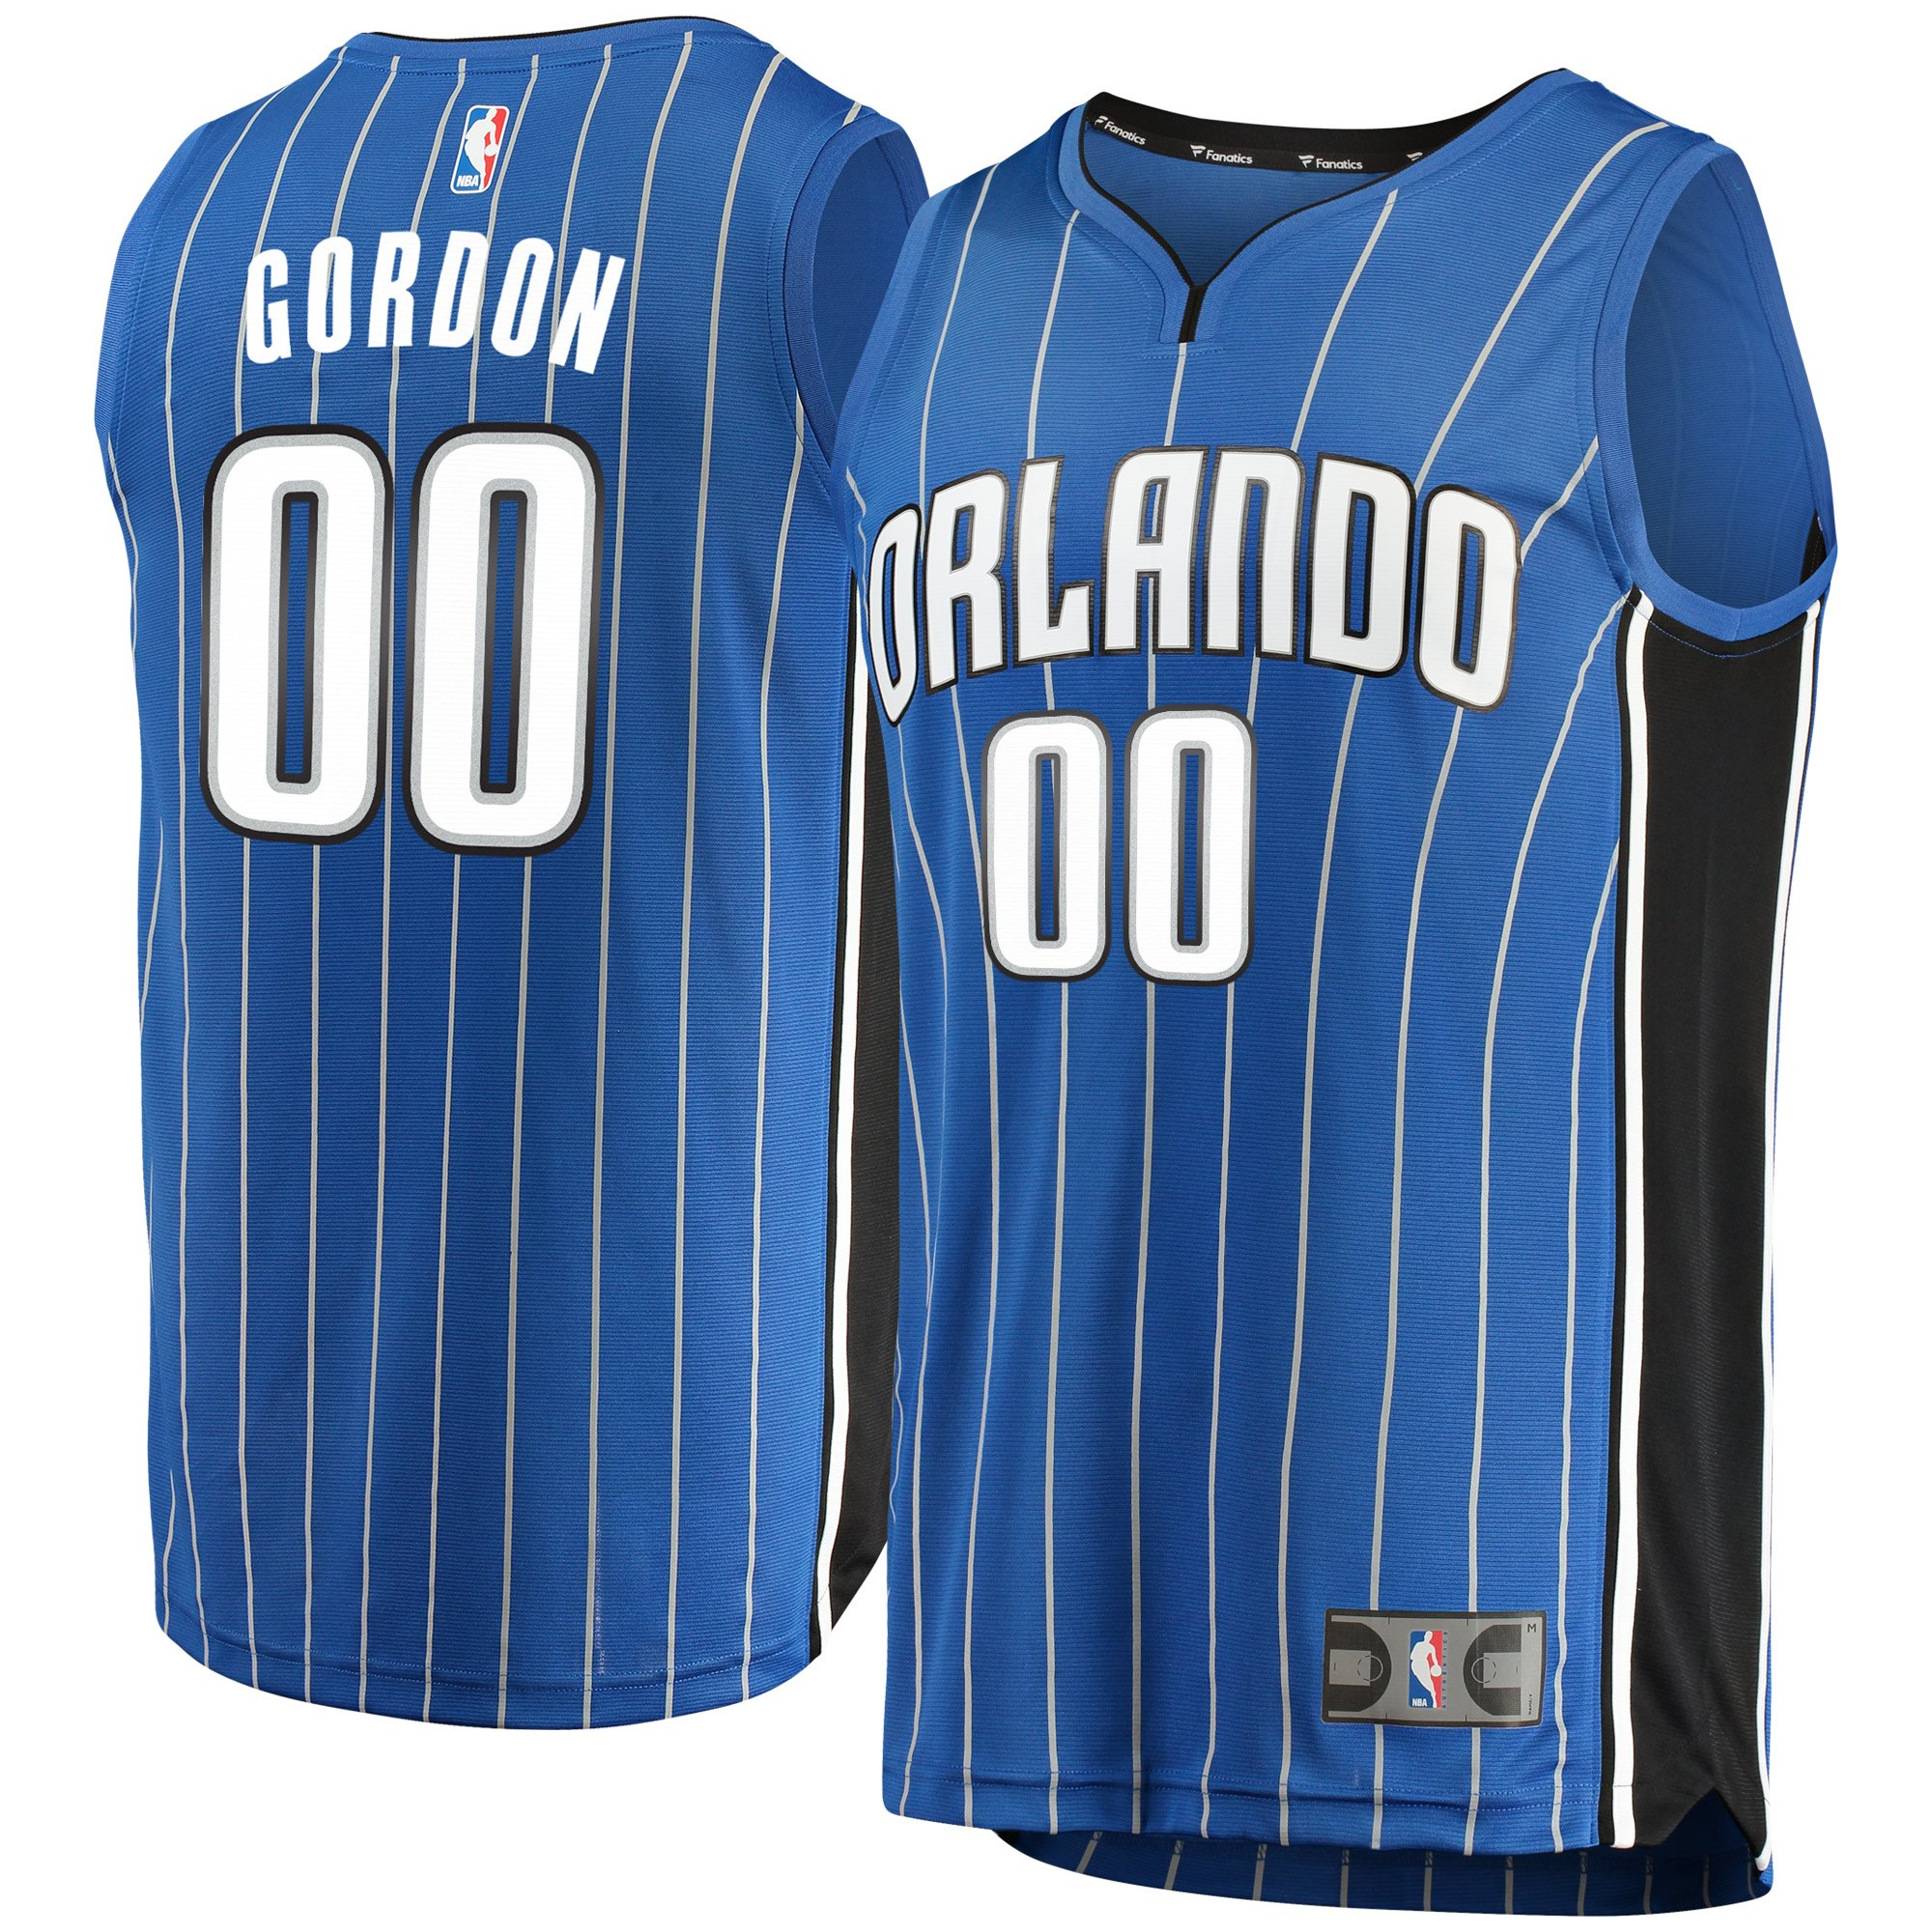 Aaron Gordon Orlando Magic Fanatics Branded Youth Fast Break Replica Jersey Blue - Icon Edition - Yth XL